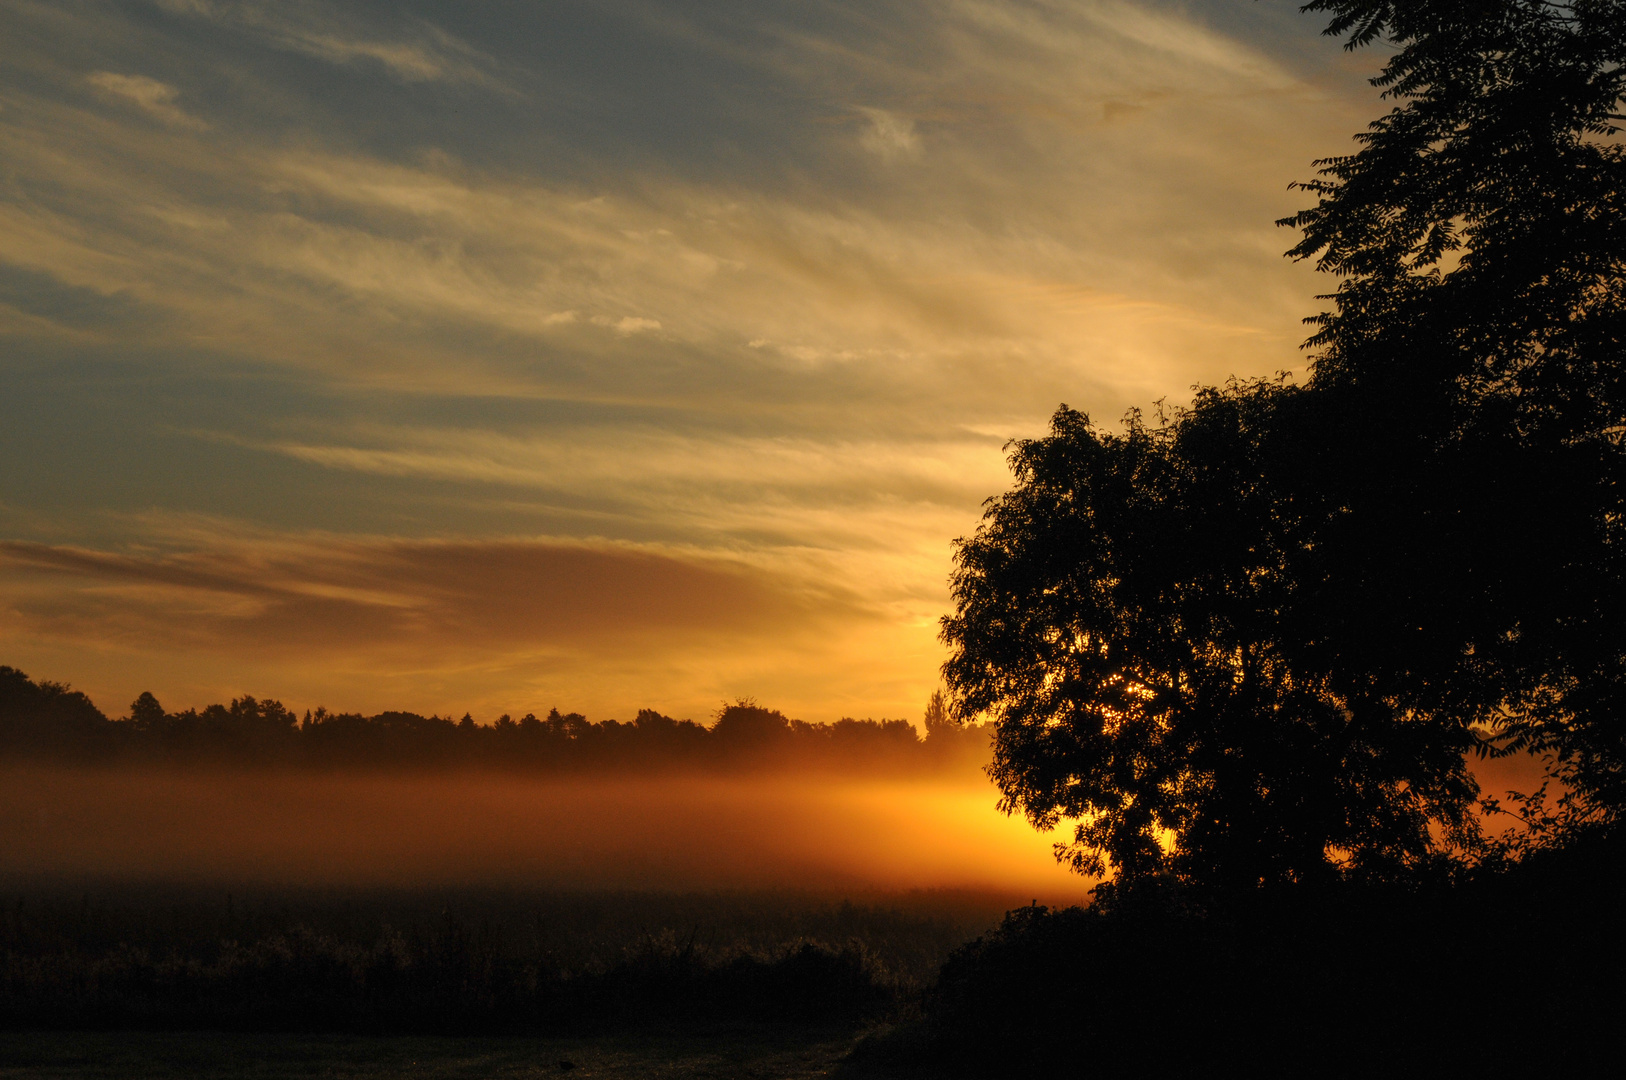 Sonnenaufgang in Dronningmölle 3